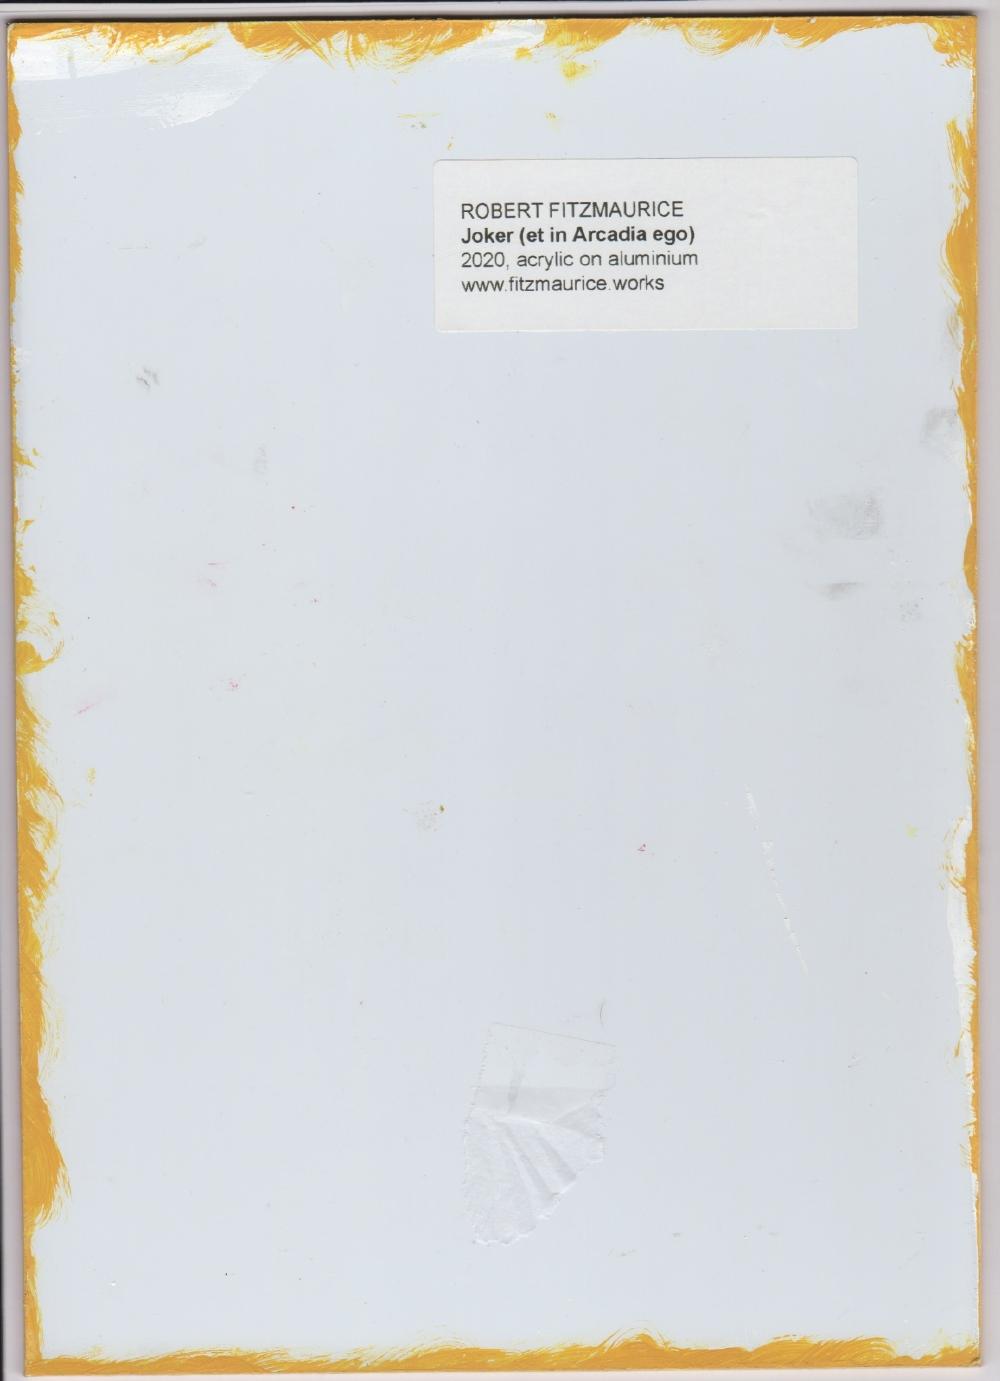 Robert Fitzmaurice (British, b.1960). 'Joker (et in Arcadia Ego)'. Acrylic on aluminium, unsigned - Image 2 of 2